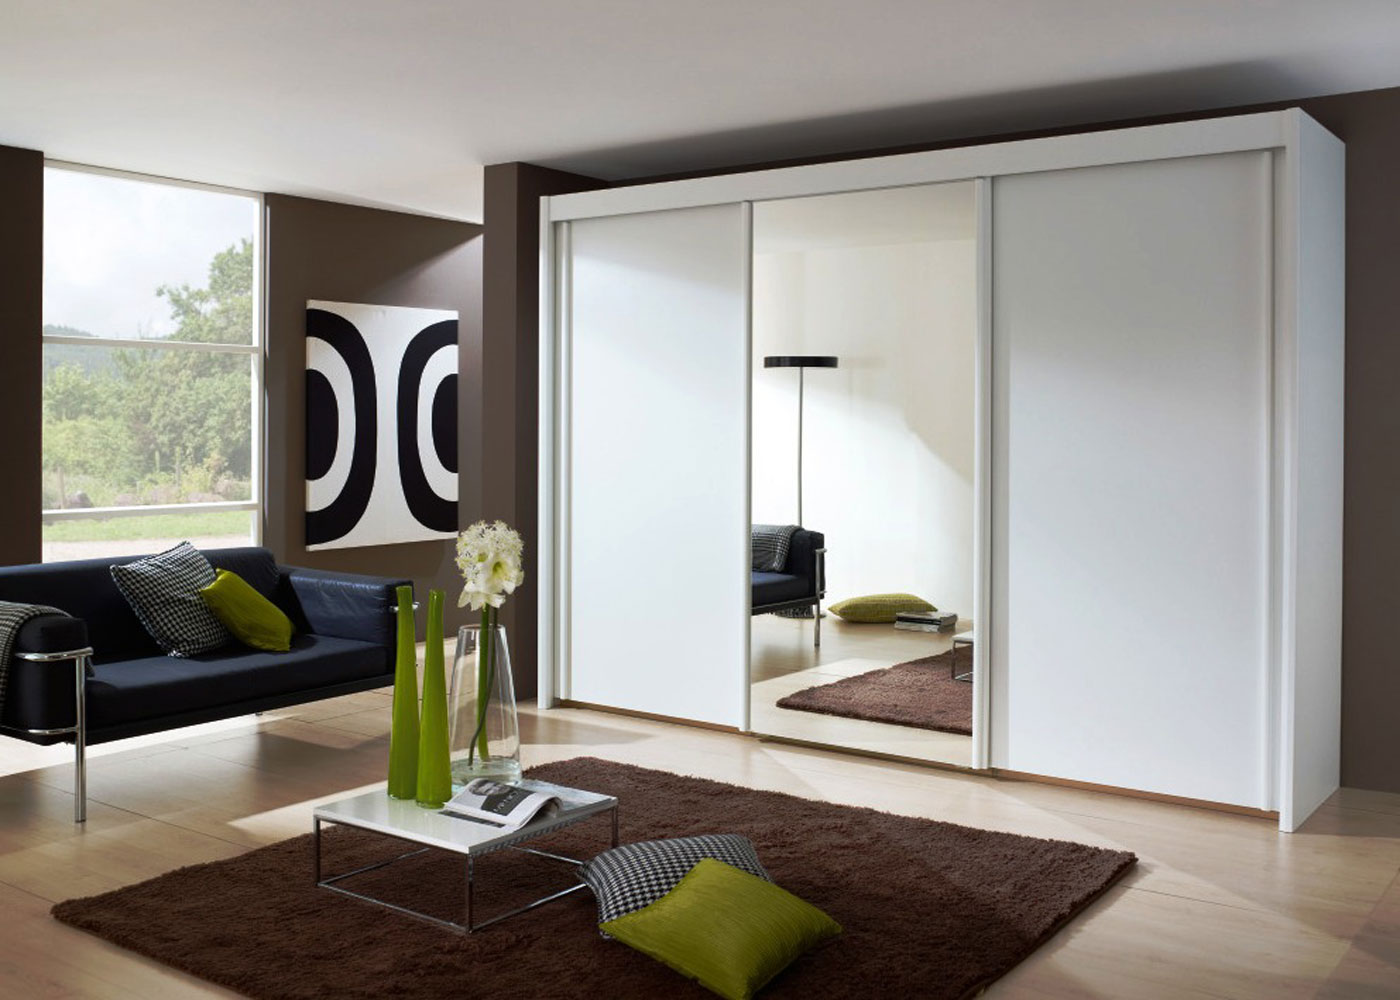 Зеркальный шкаф купе дизайн